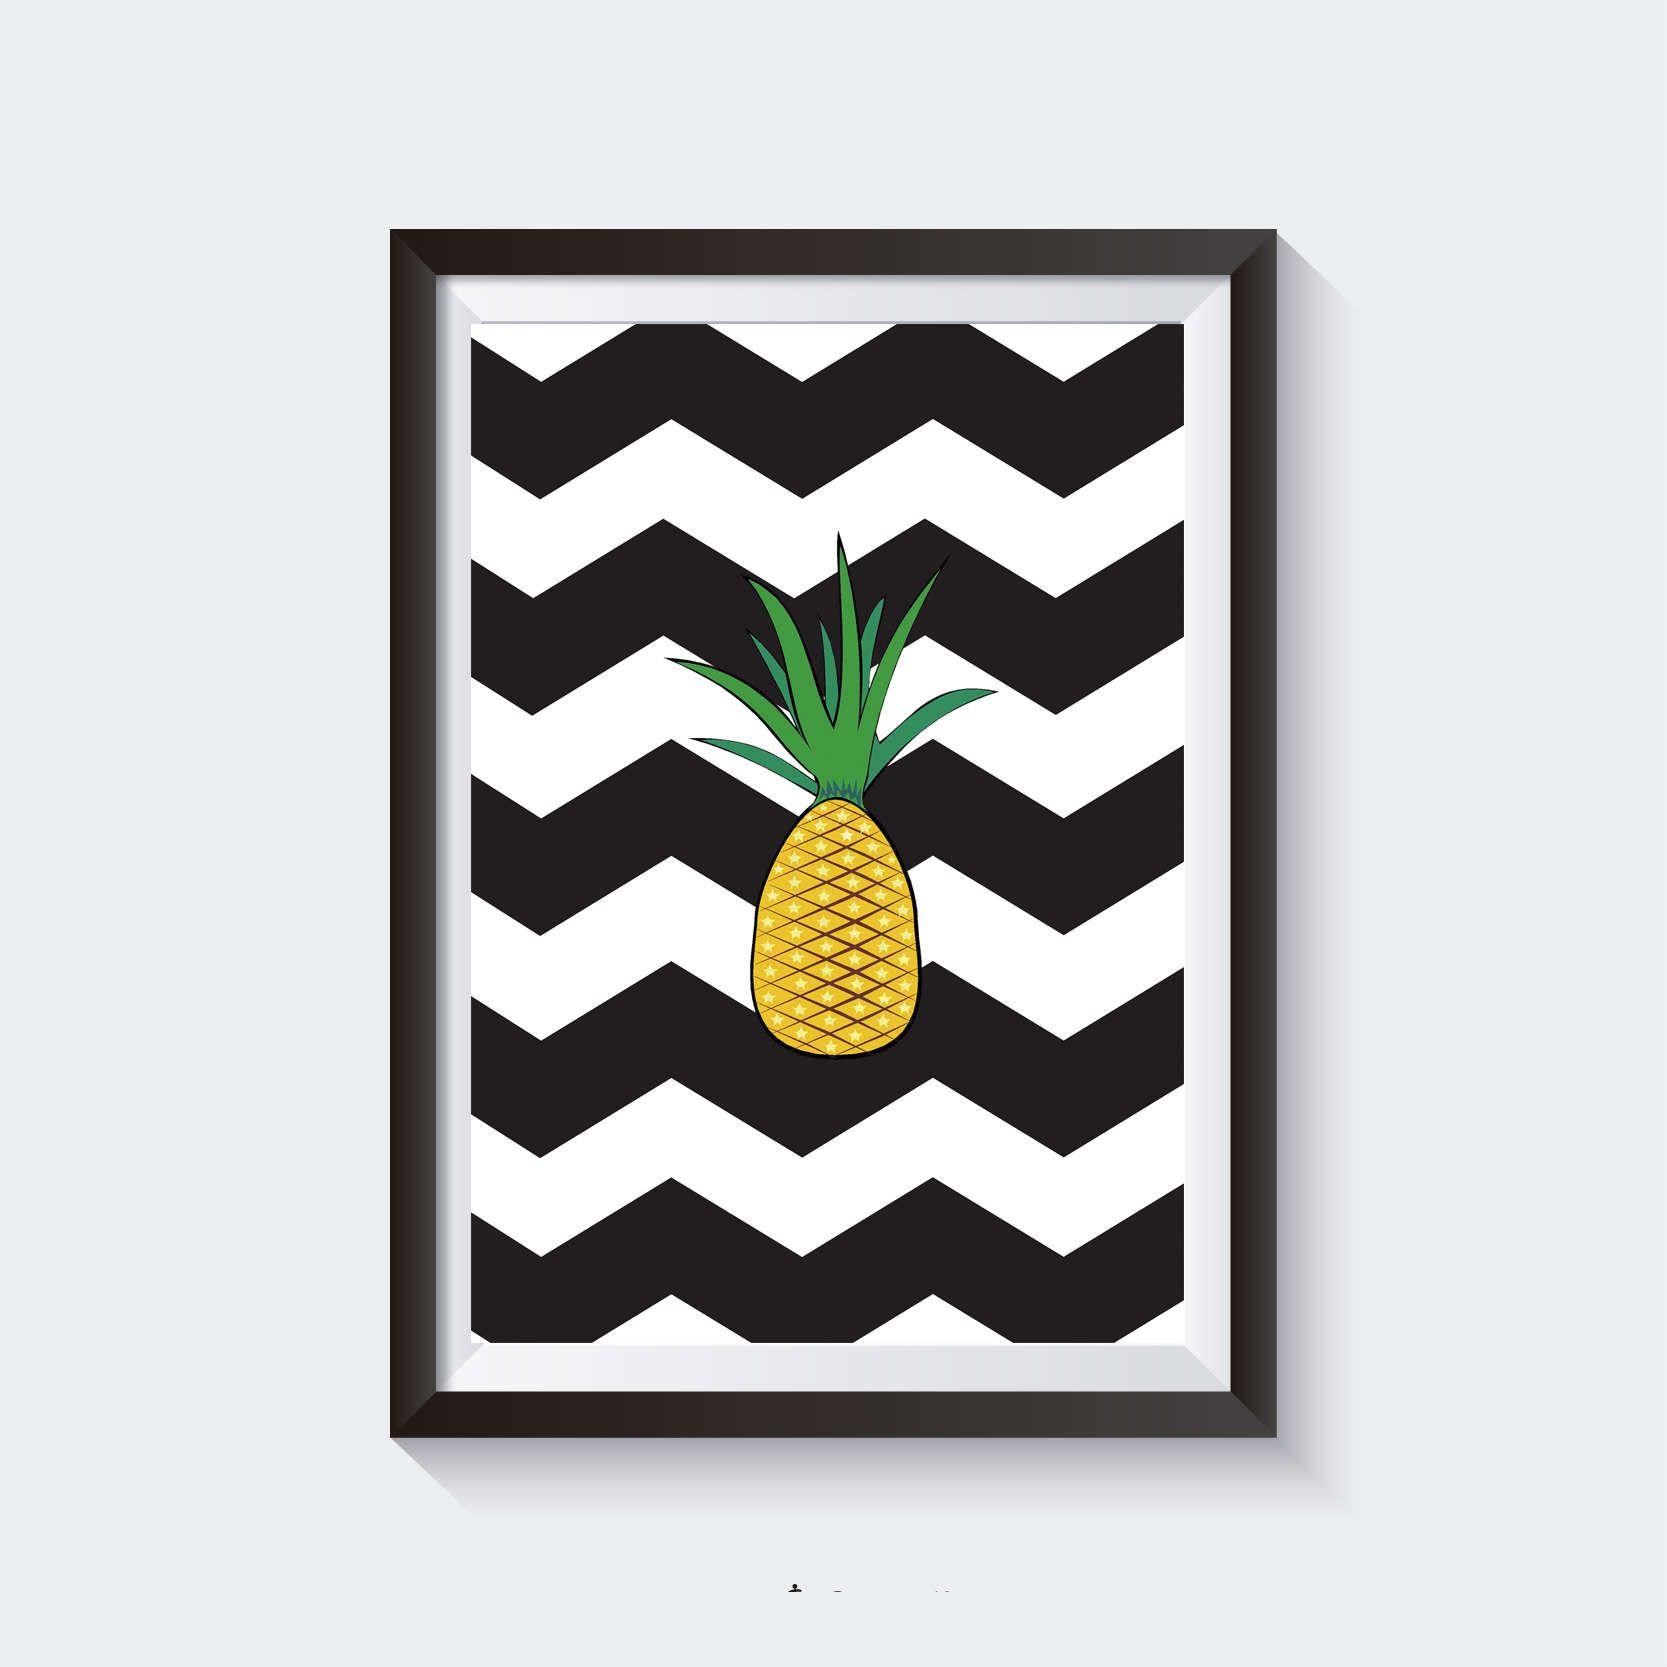 Quadro Abacaxi Imprimir Pinterest Quartos Quadros  ~ Imagens Para Quadros De Quarto Para Imprimir Abacaxi